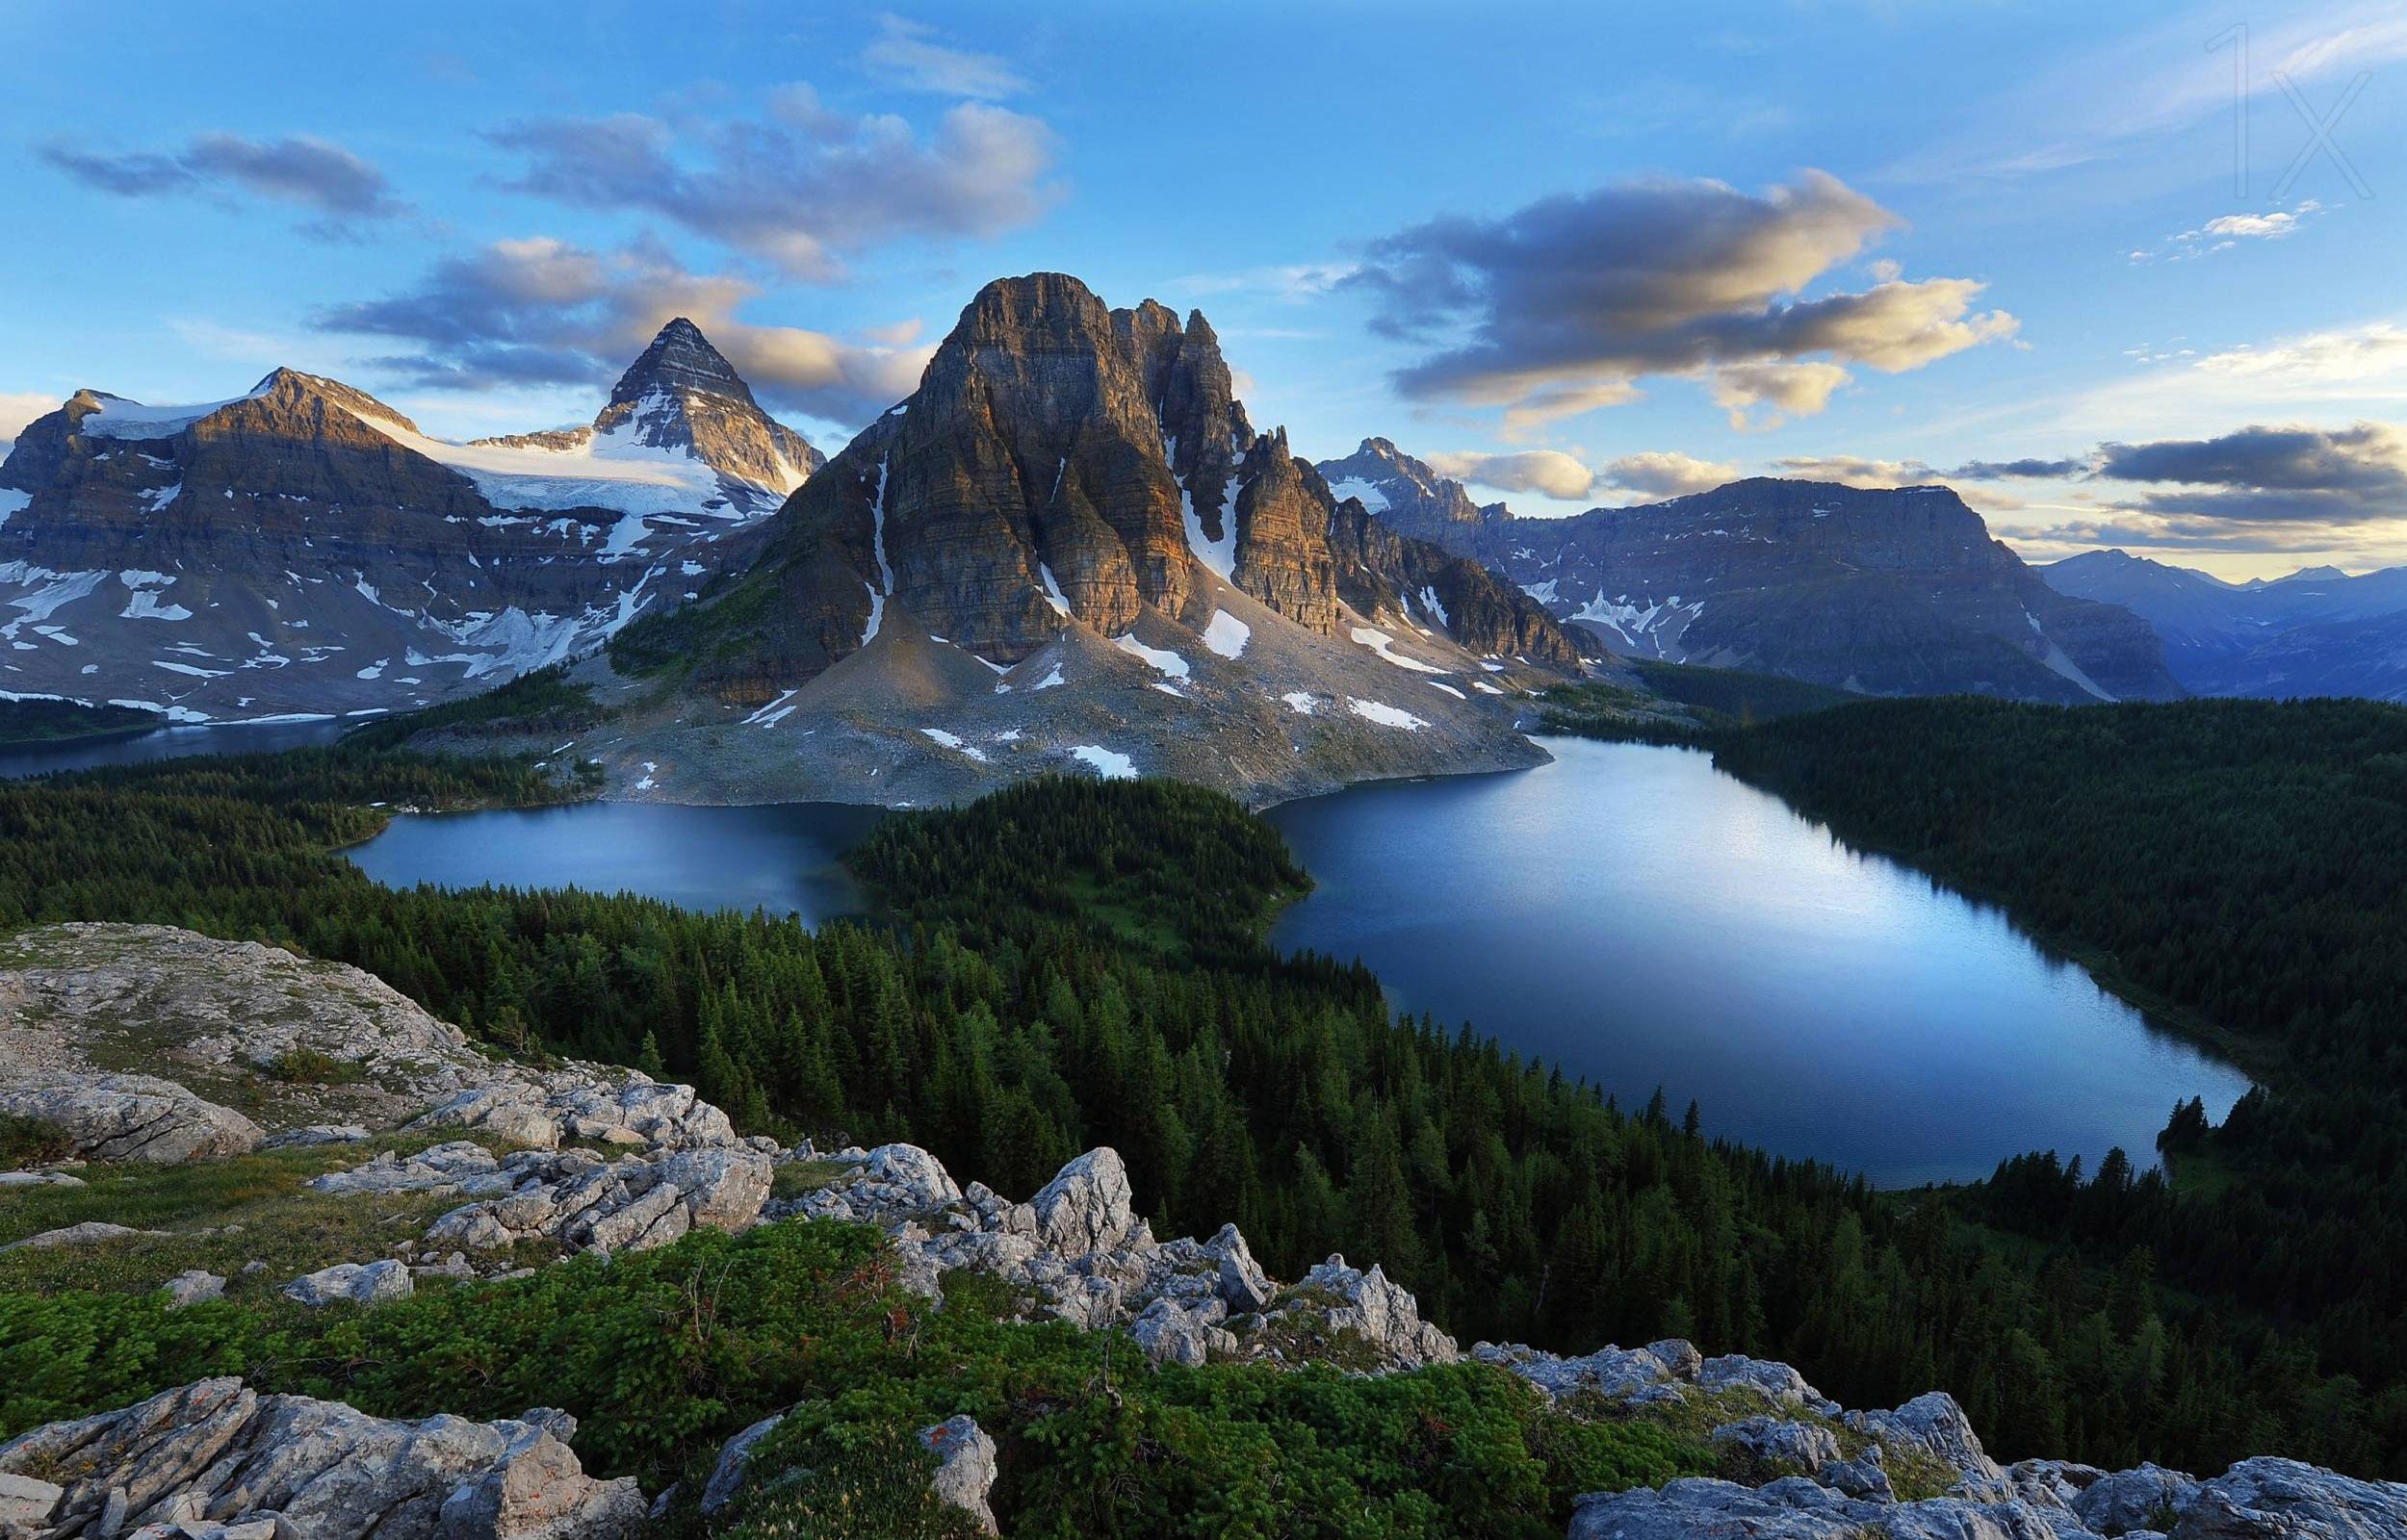 Mount Assiniboine Pics, Earth Collection